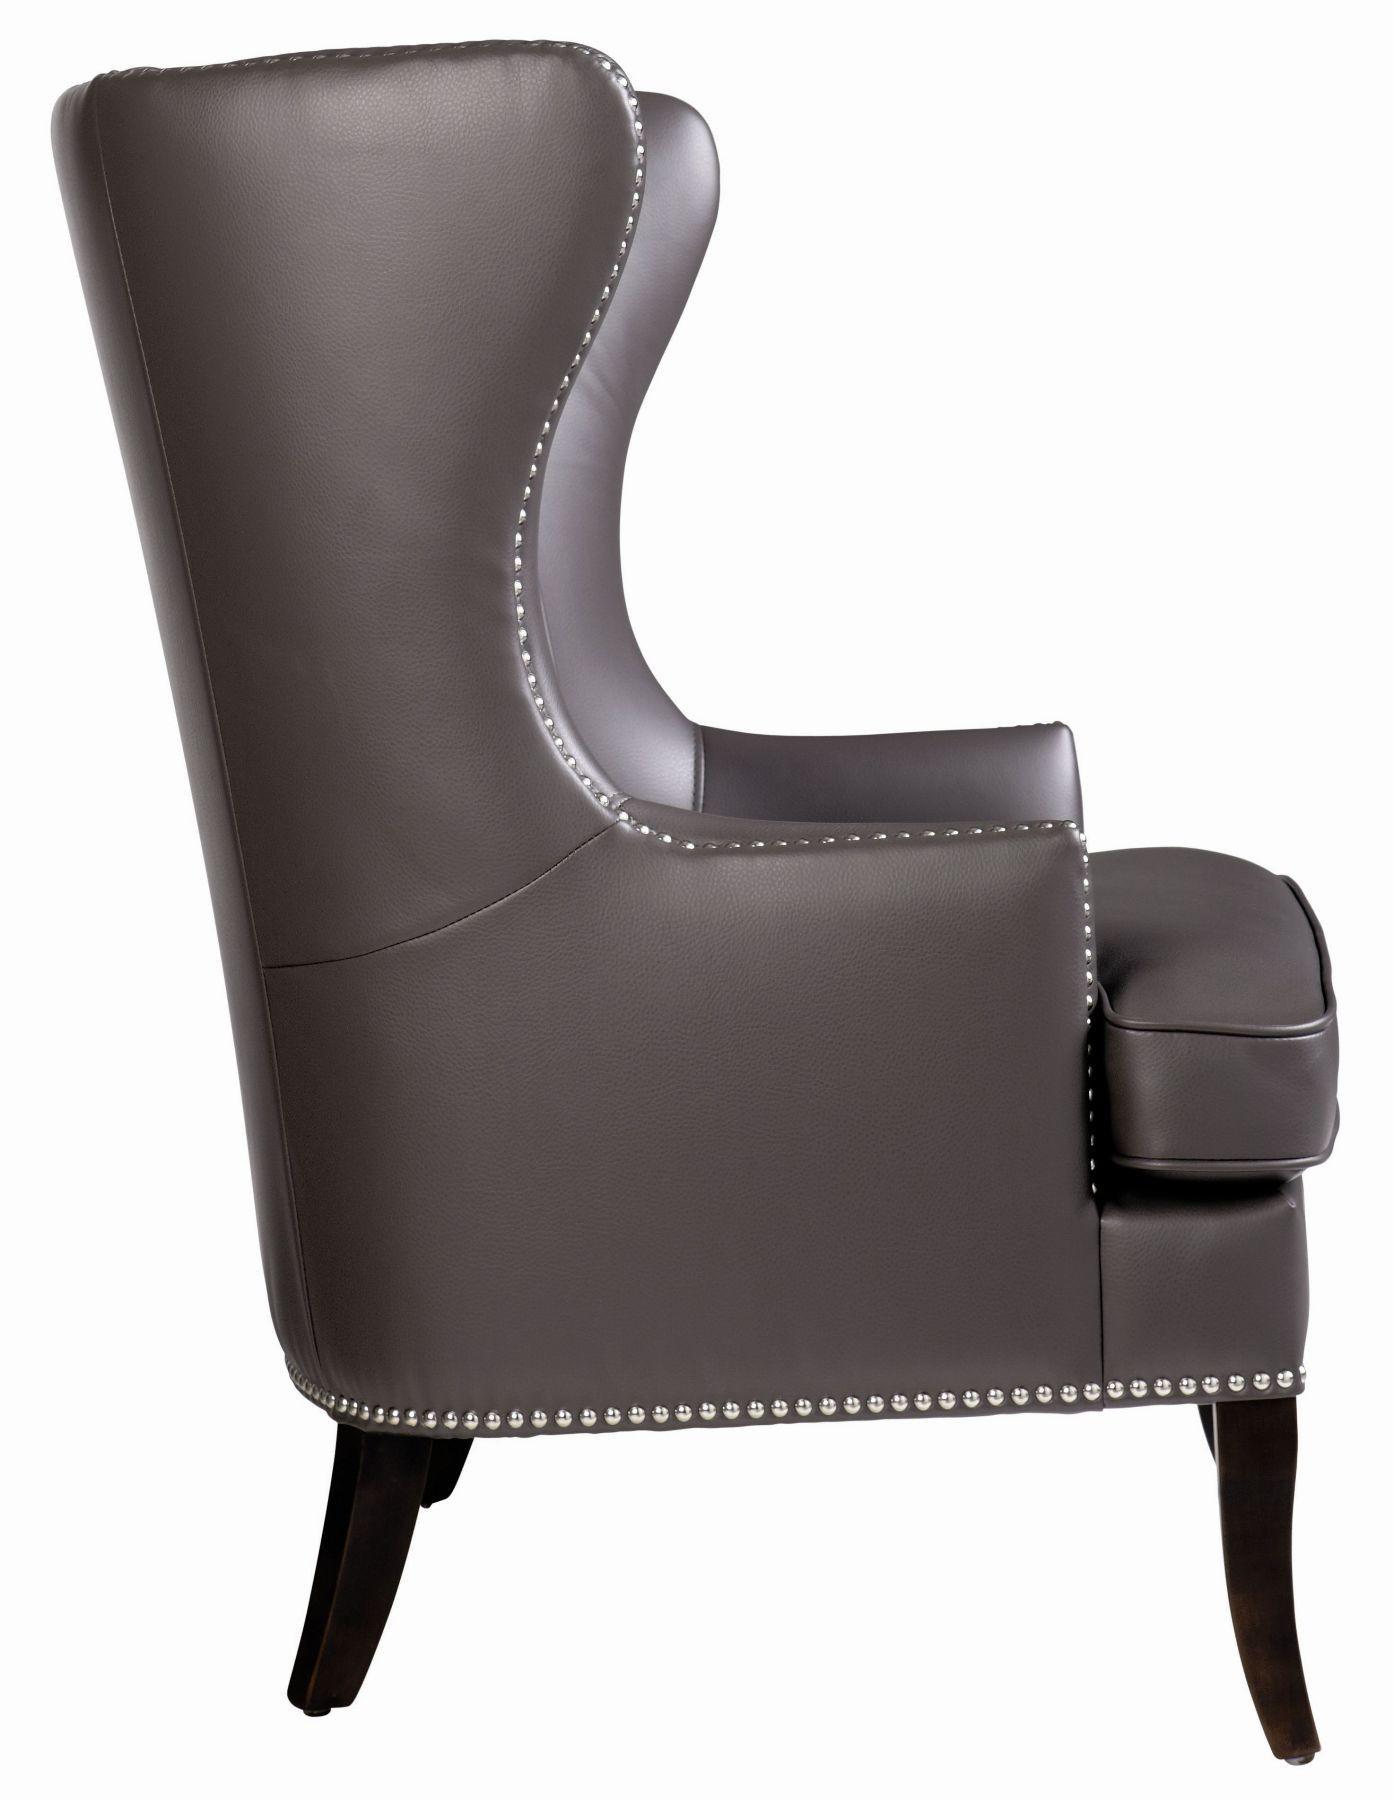 grey arm chair hollywood regency royalton from sunpan 31048 coleman